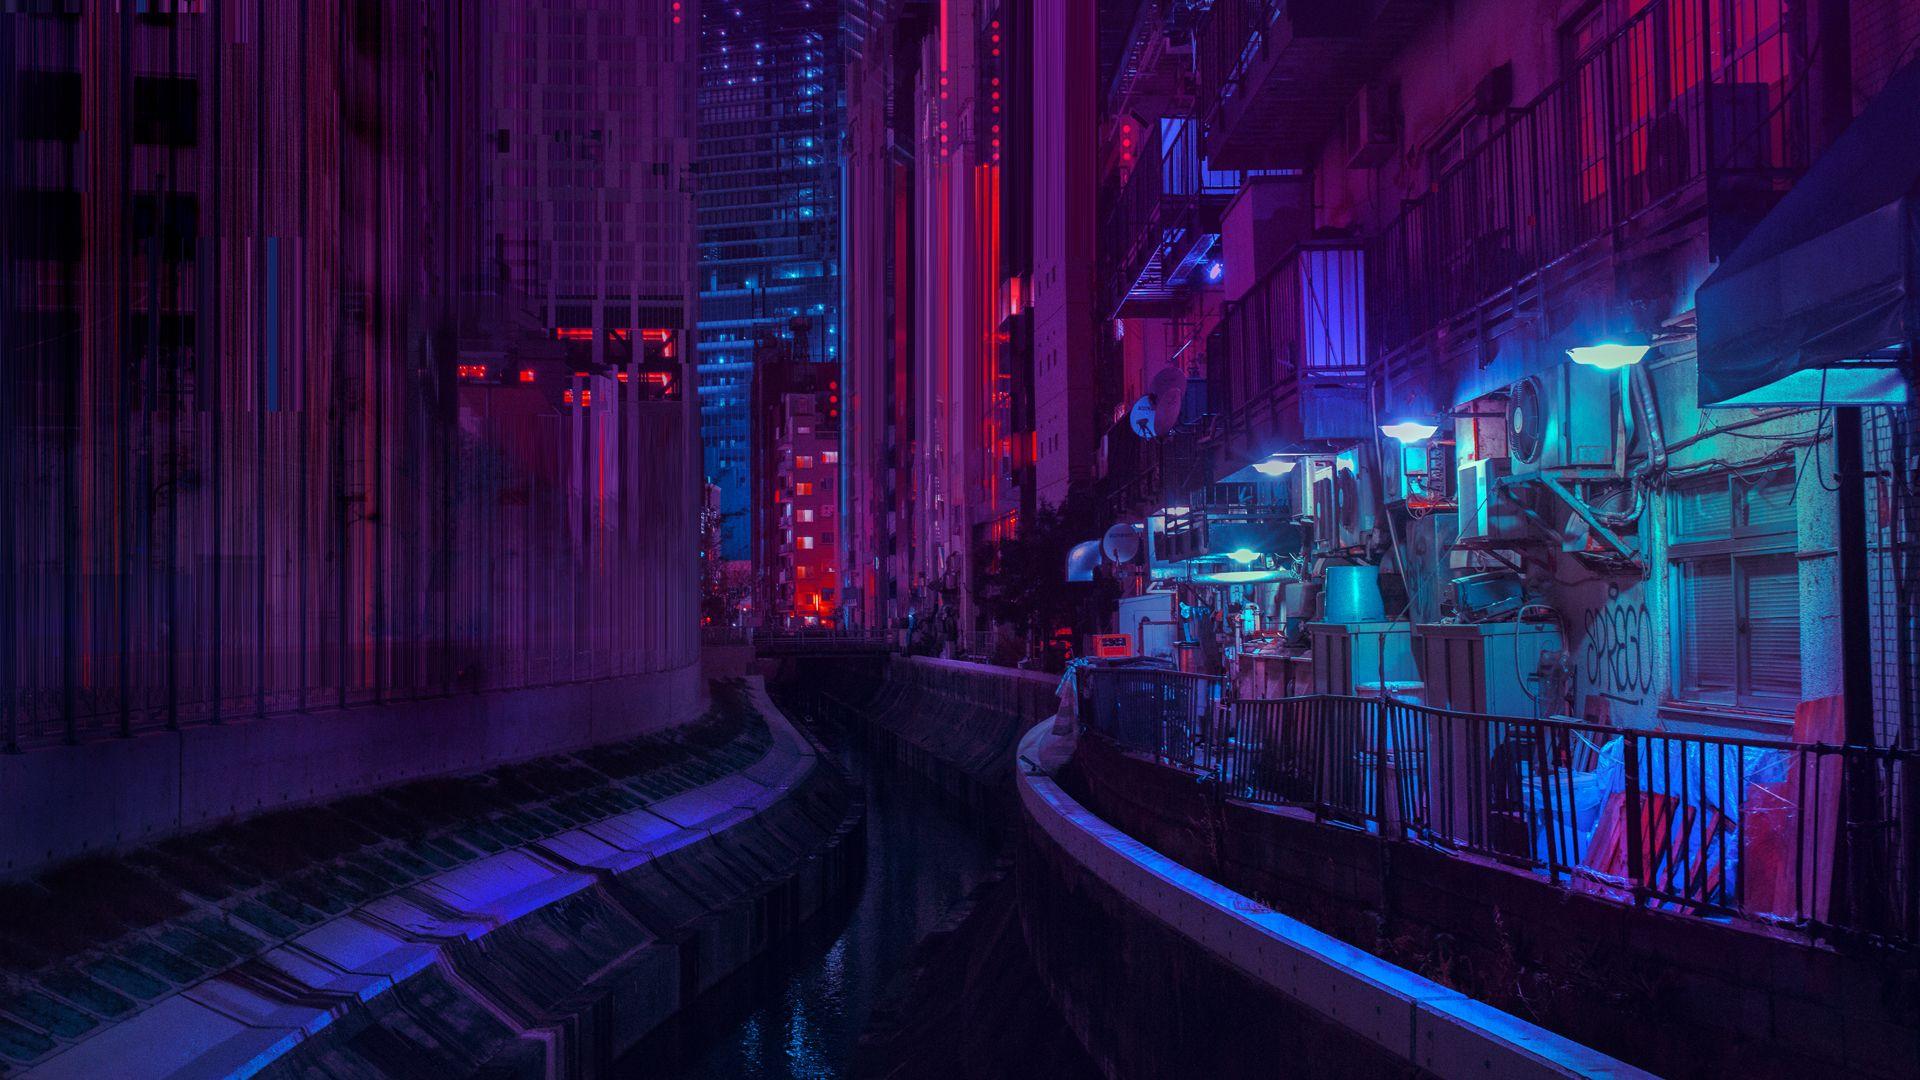 Tokyo Nights II Pursuing Rain & Neons Neon nights